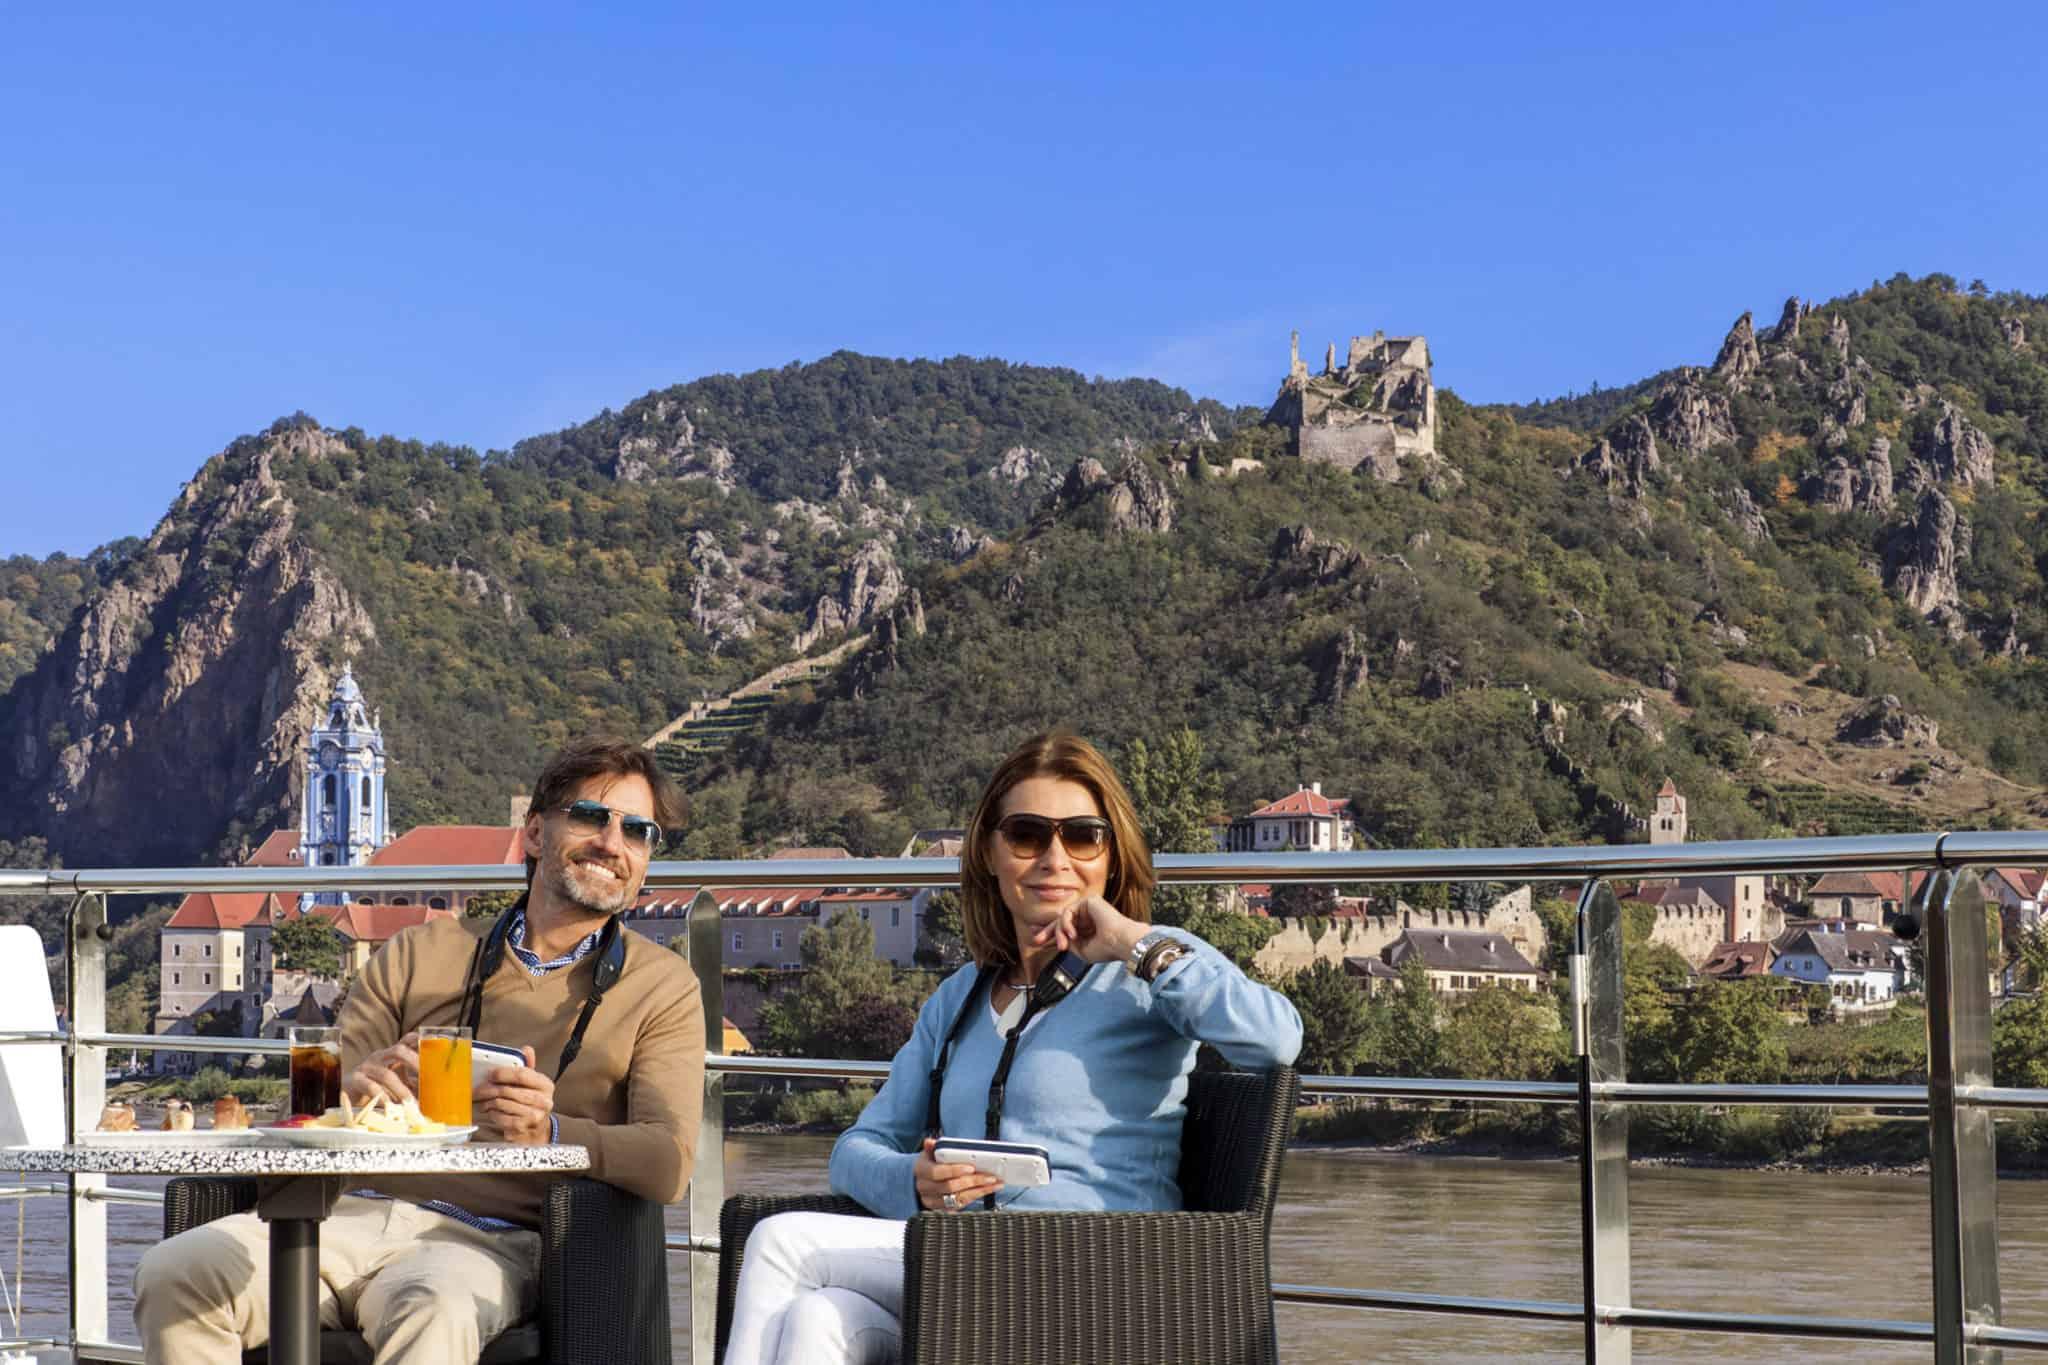 Trek Travel Amp Scenic Cruises To Offer Bike Cruises In 2017